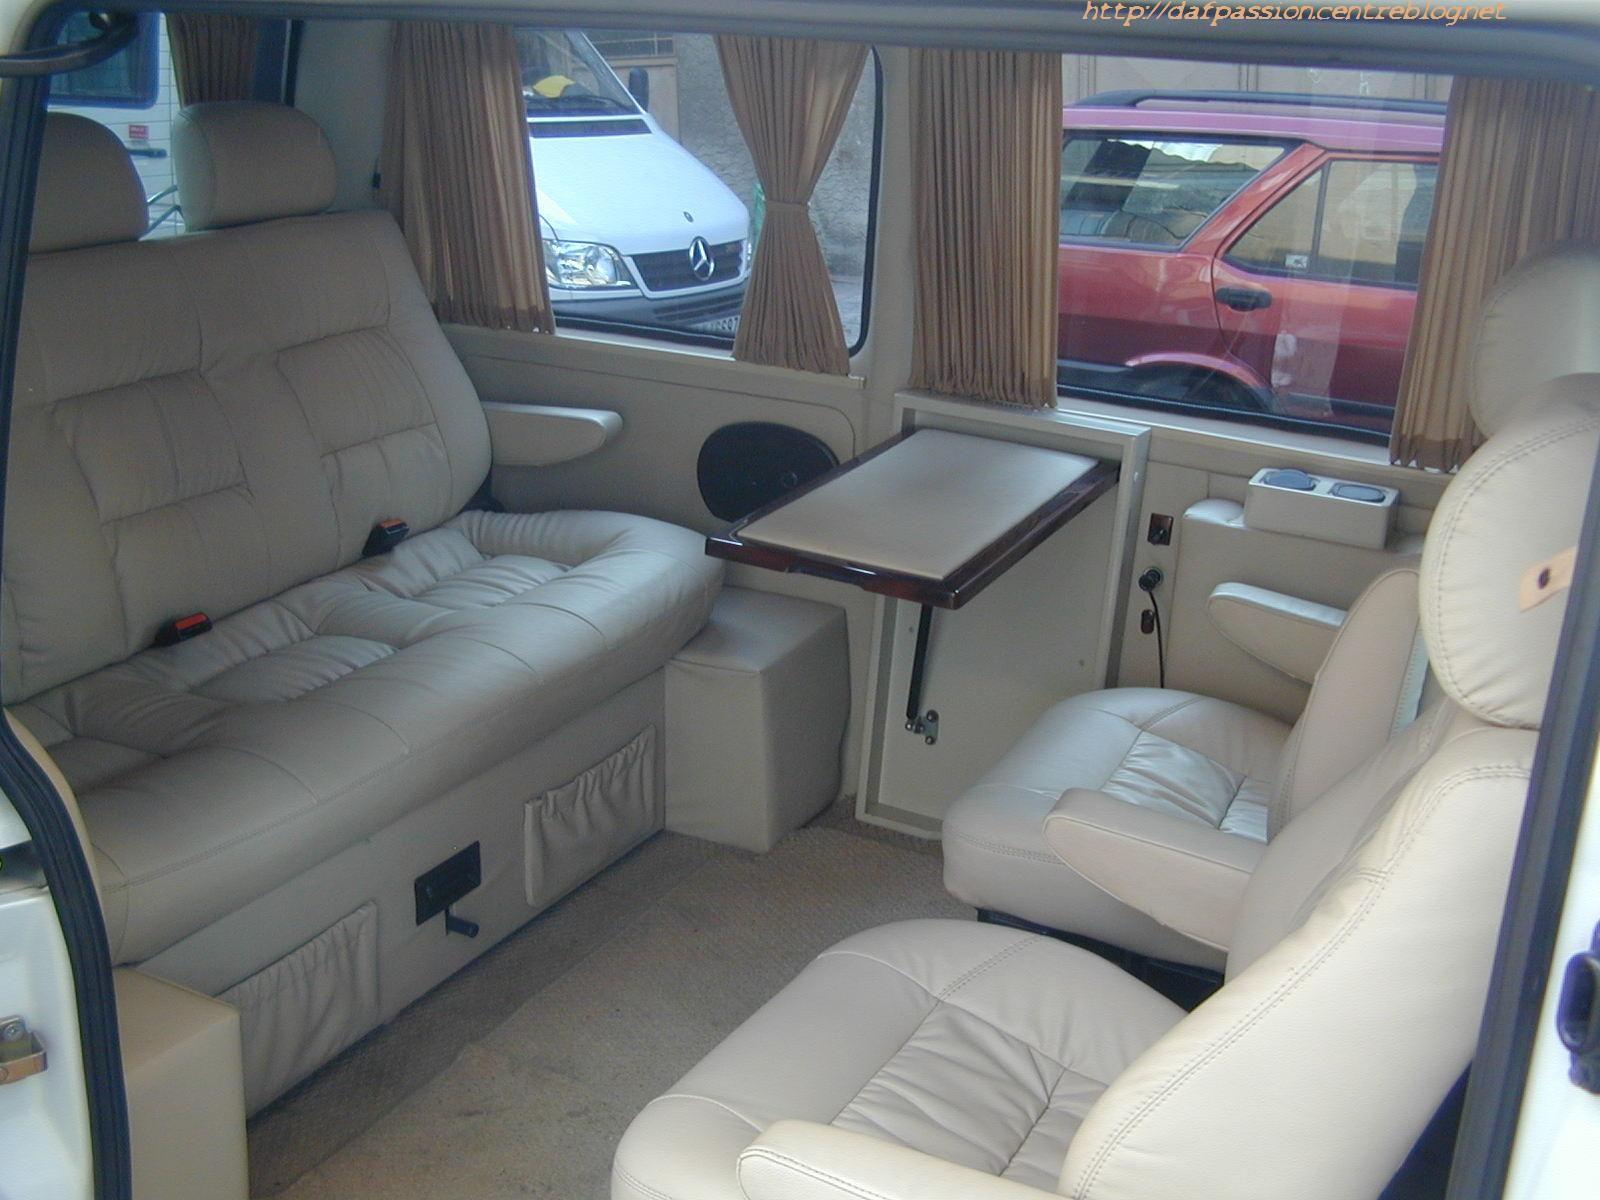 Mercedes vito - mercedes vito interieur